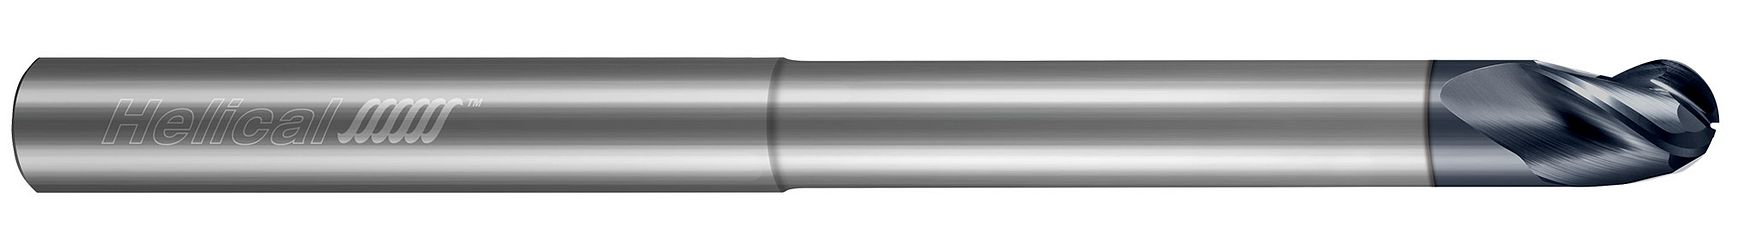 tool-details-13347